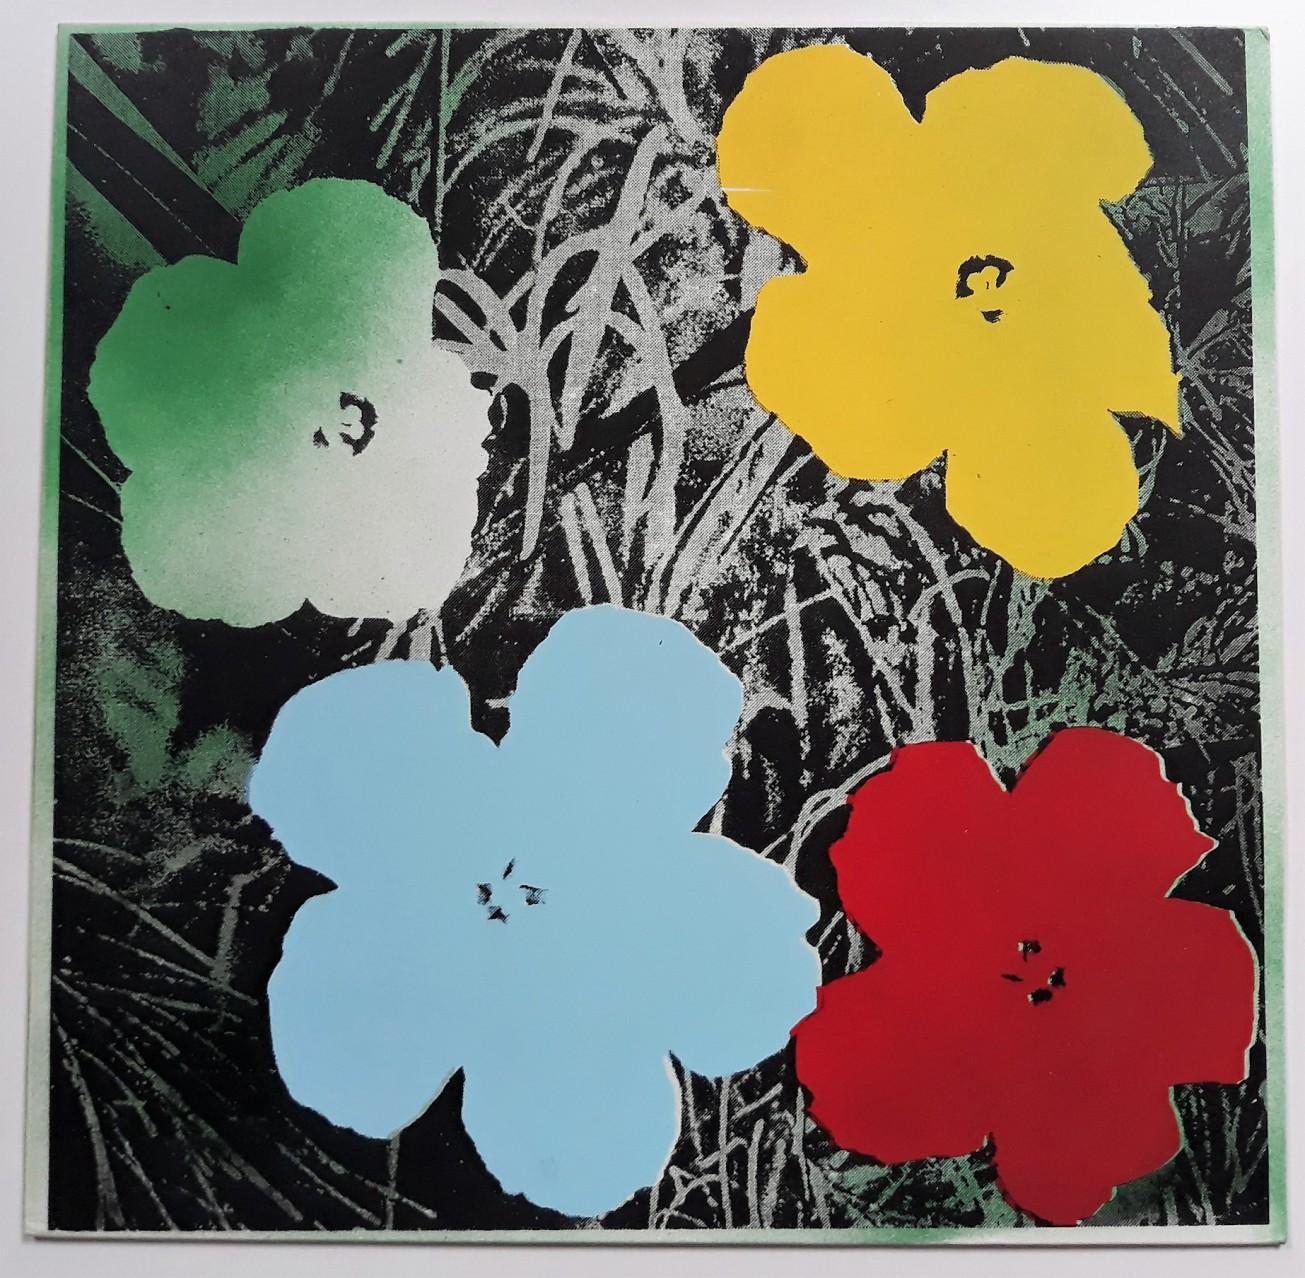 arab-spring-warhol-cover-1